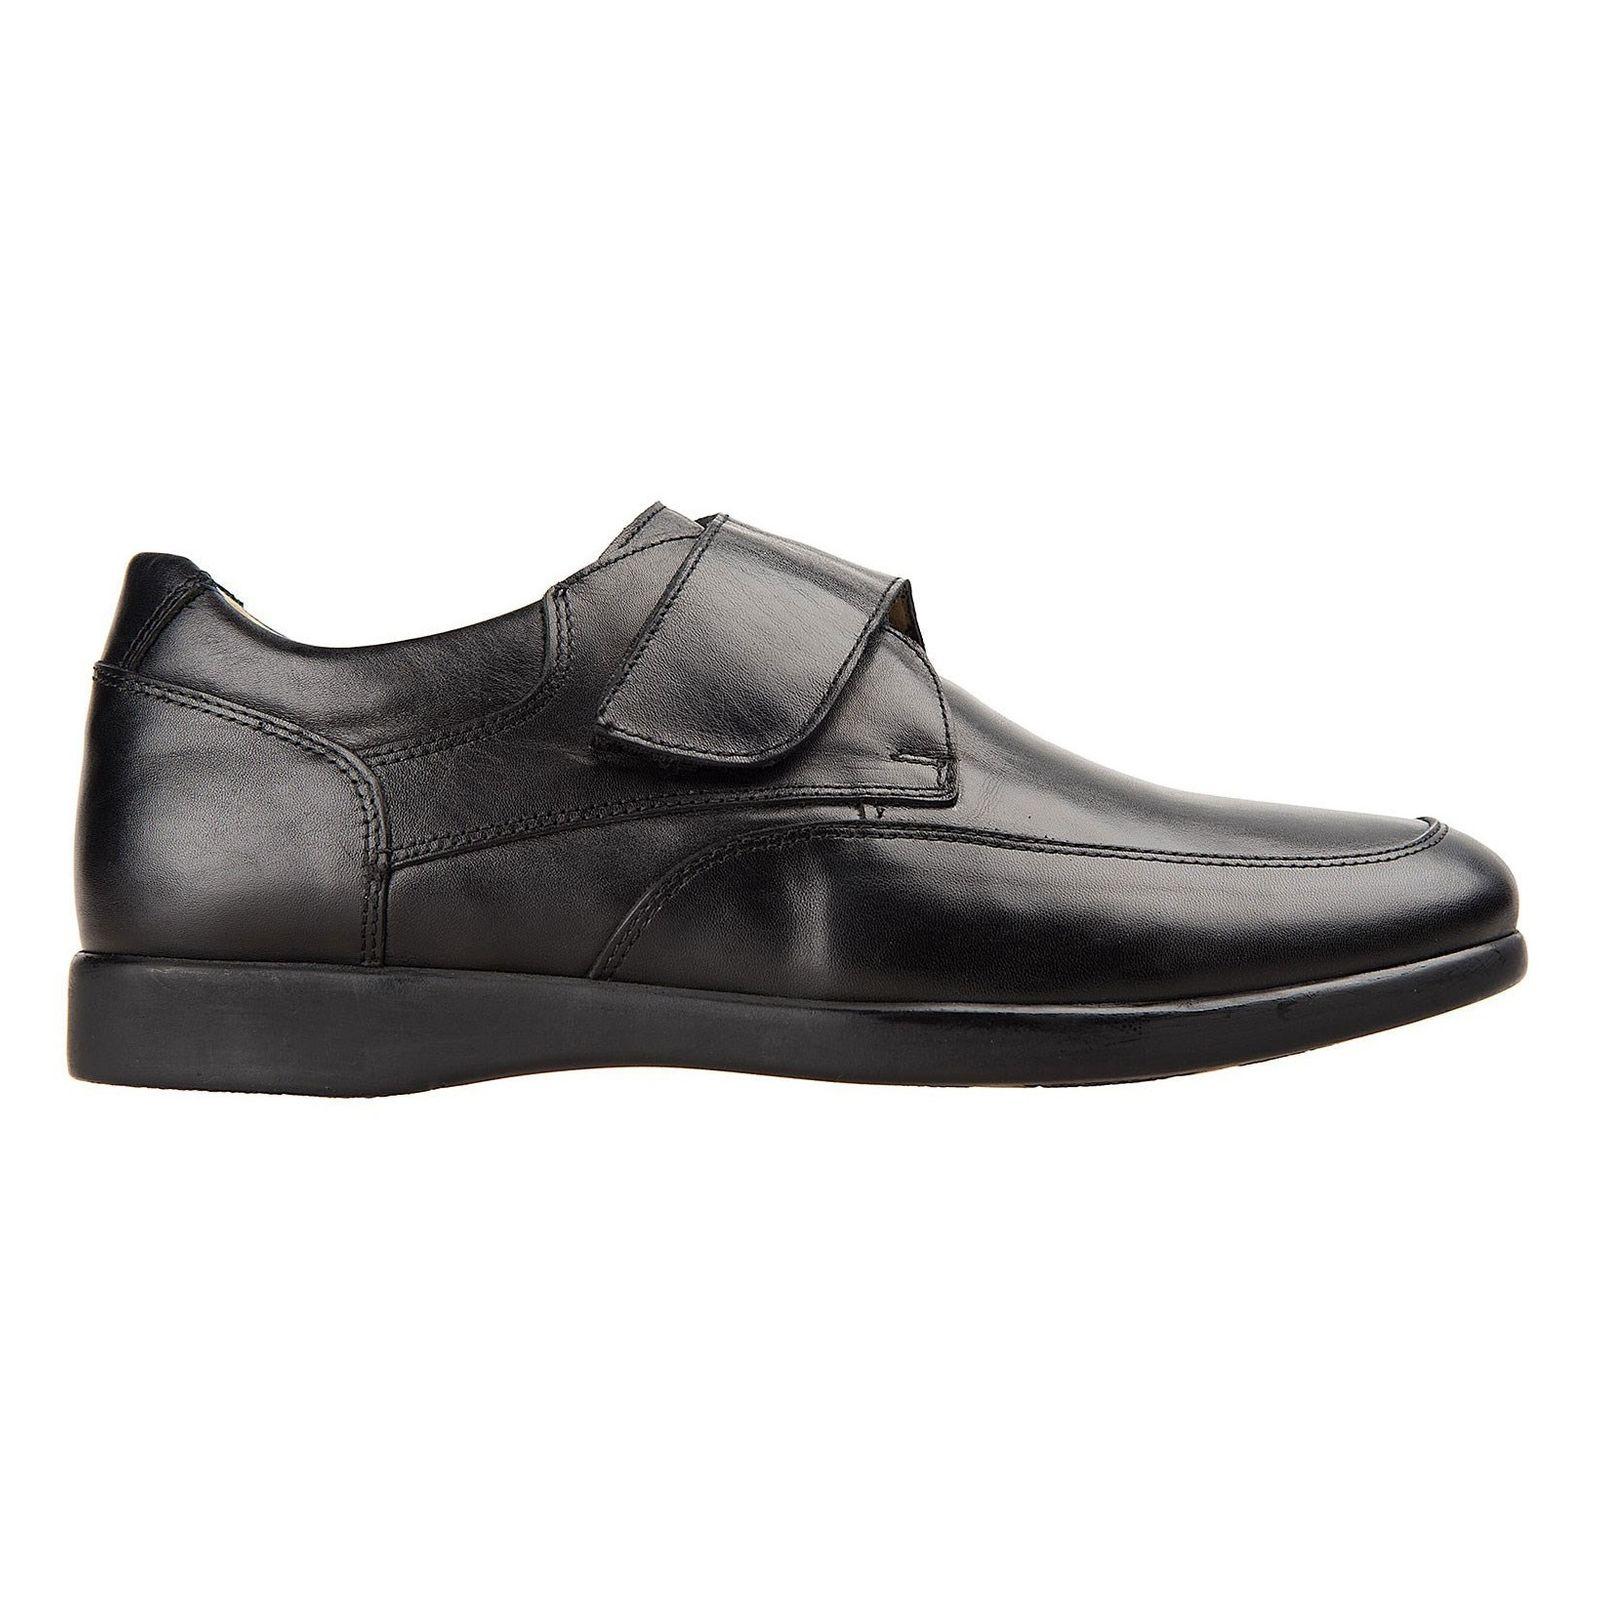 کفش اداری چرم مردانه - شهر چرم - مشکي - 1